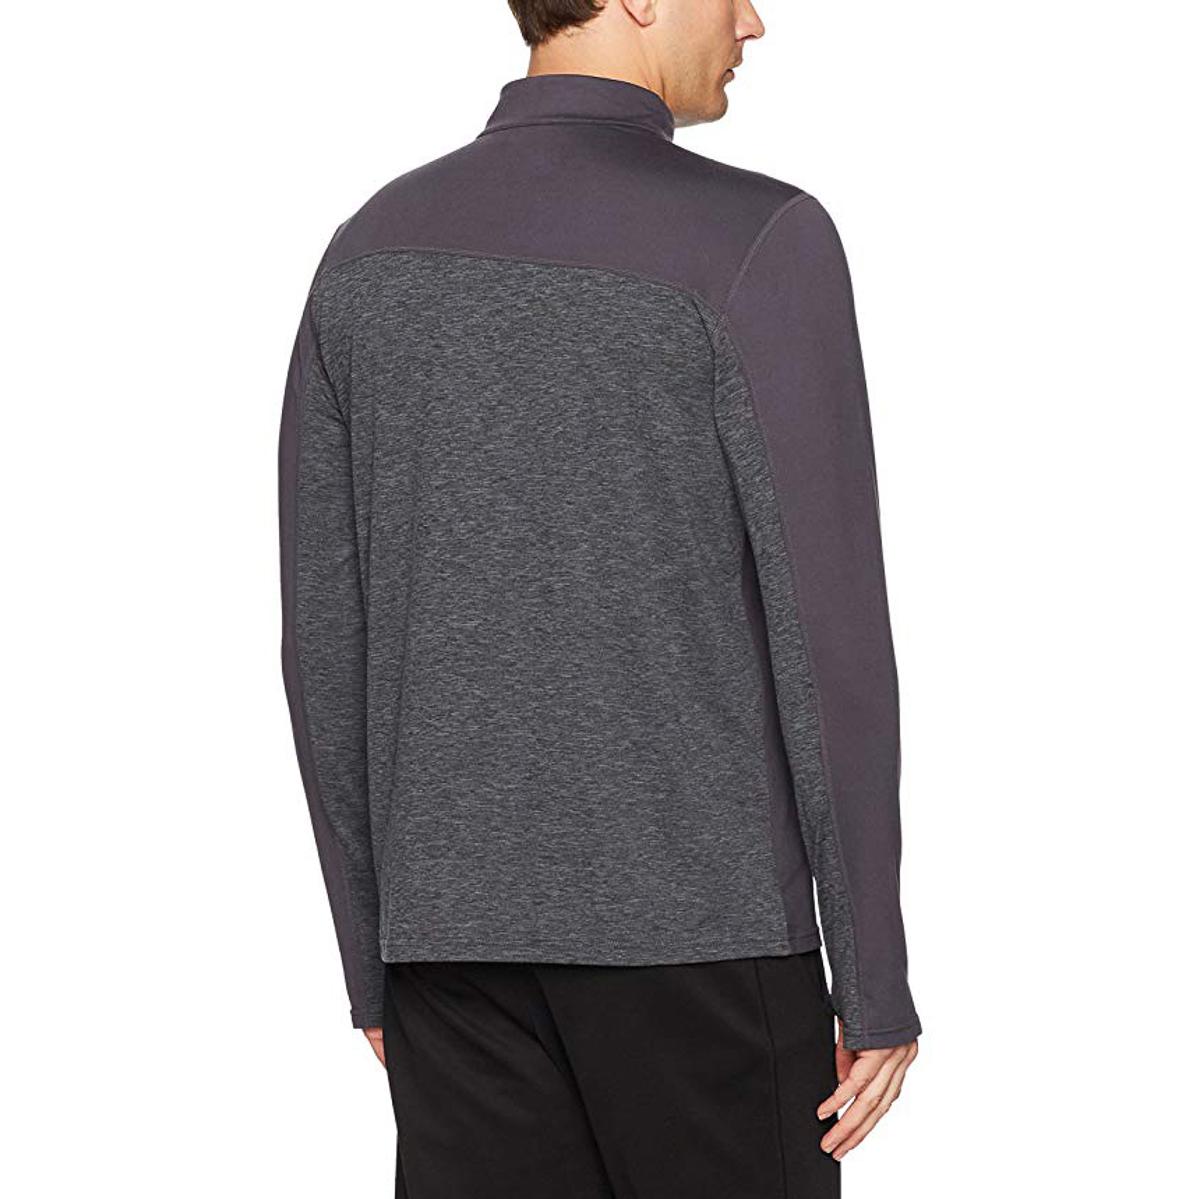 Asics-Sports-Half-Zip-Long-Sleeve-Pullover-Athletic-Men-s-Shirt-Motion-Dry-Tech thumbnail 7